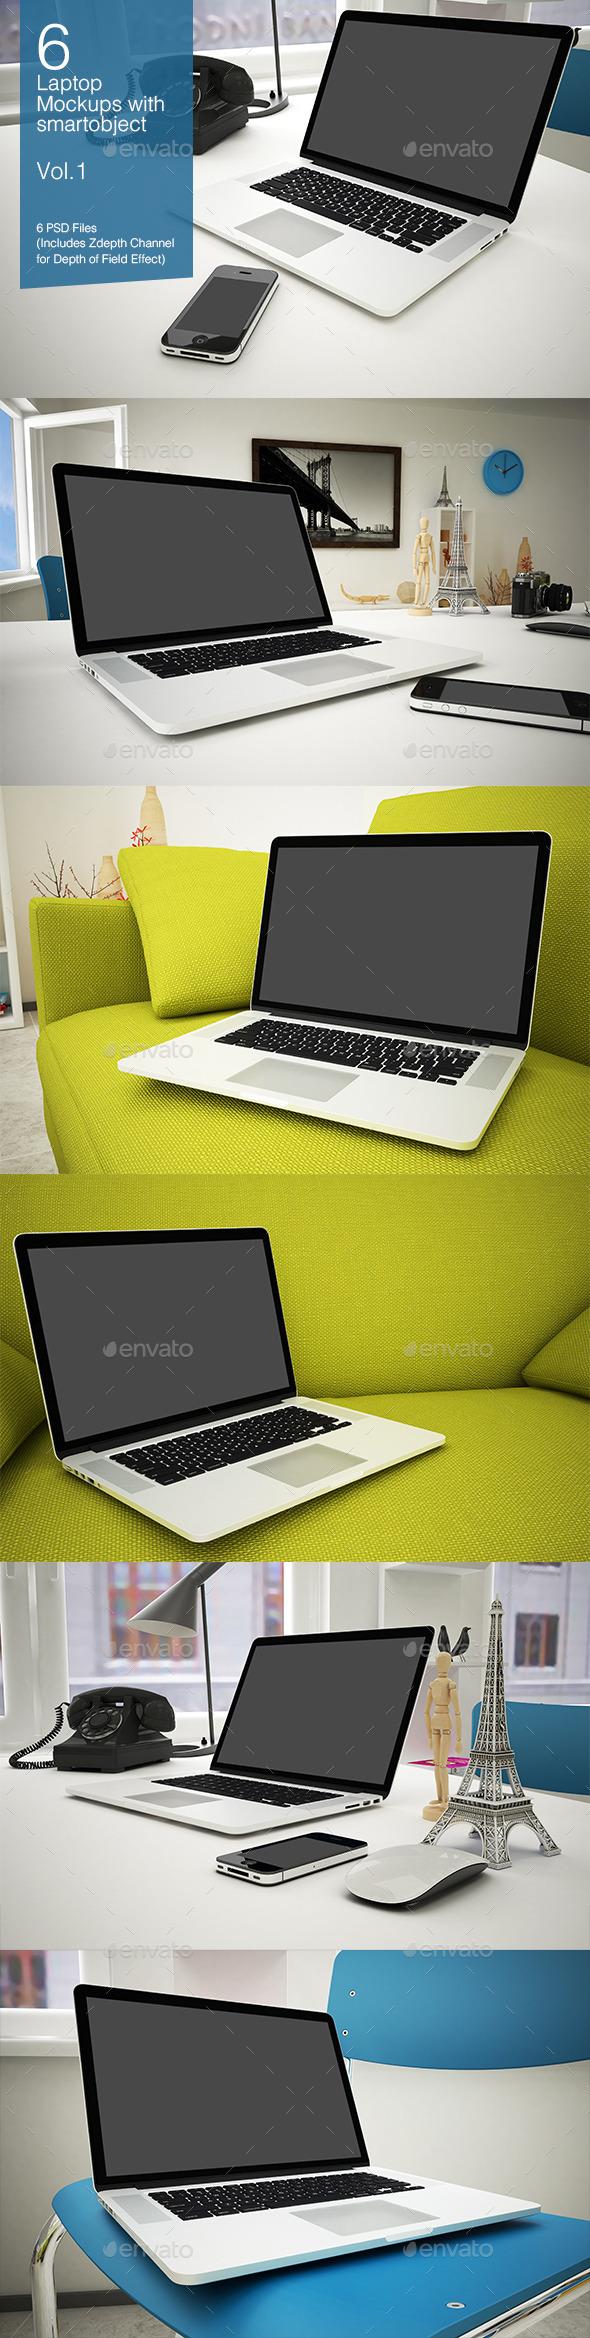 GraphicRiver Laptop Mockup 6 Poses Vol.1 8927410